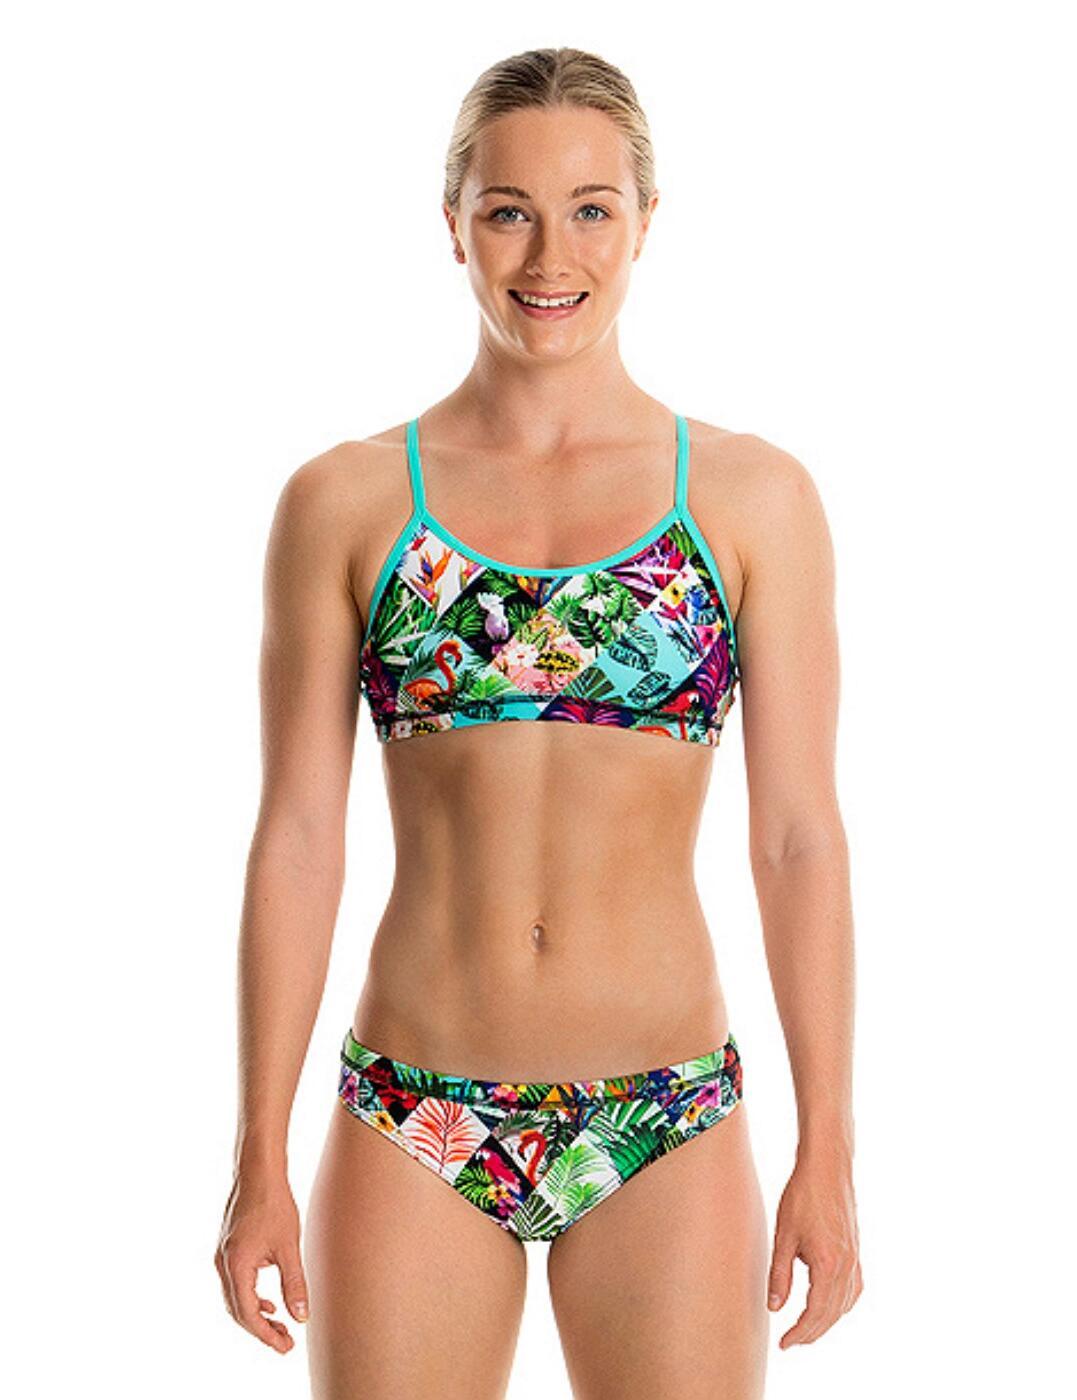 FS02G01508 Funkita Girls Racerback Two Piece Bikini Set - FS02G01508 Jungle Jam